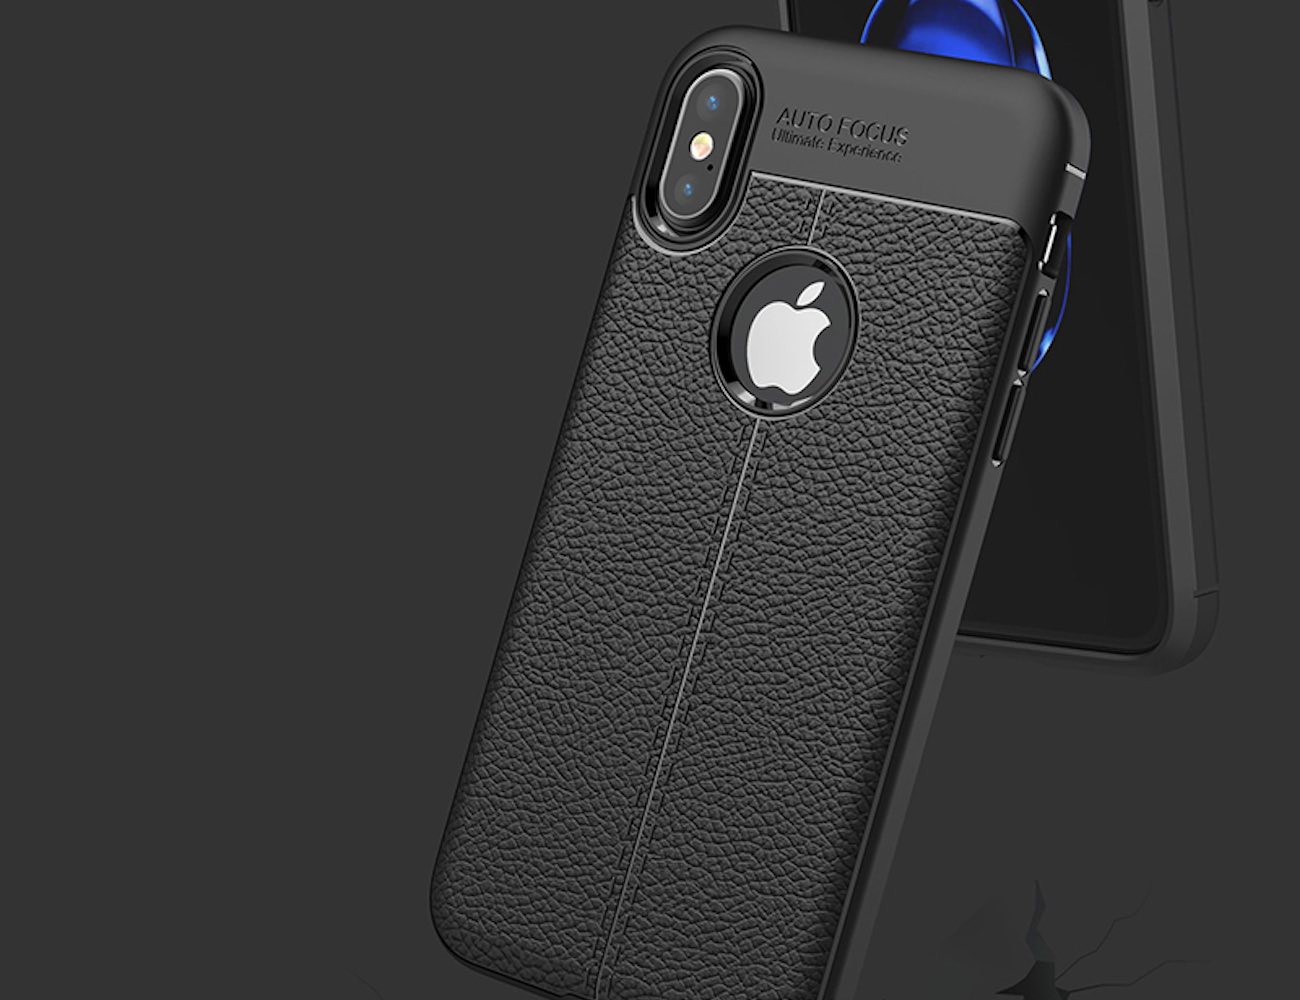 Ultra-Thin iPhone X Case